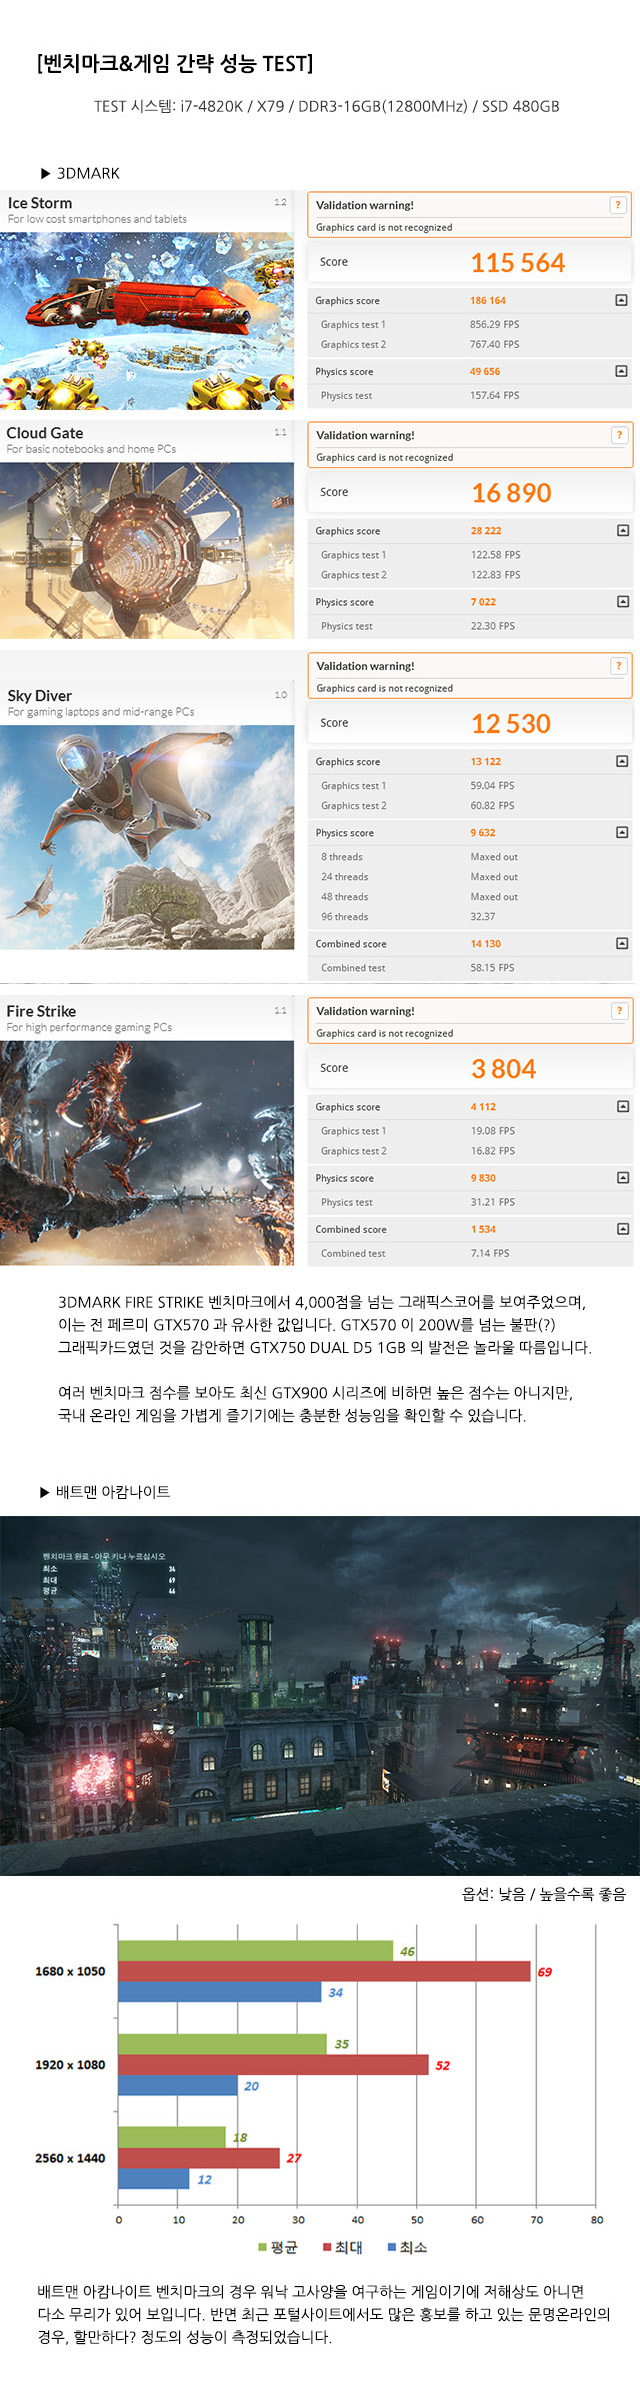 GTX750_Dual_04.jpg